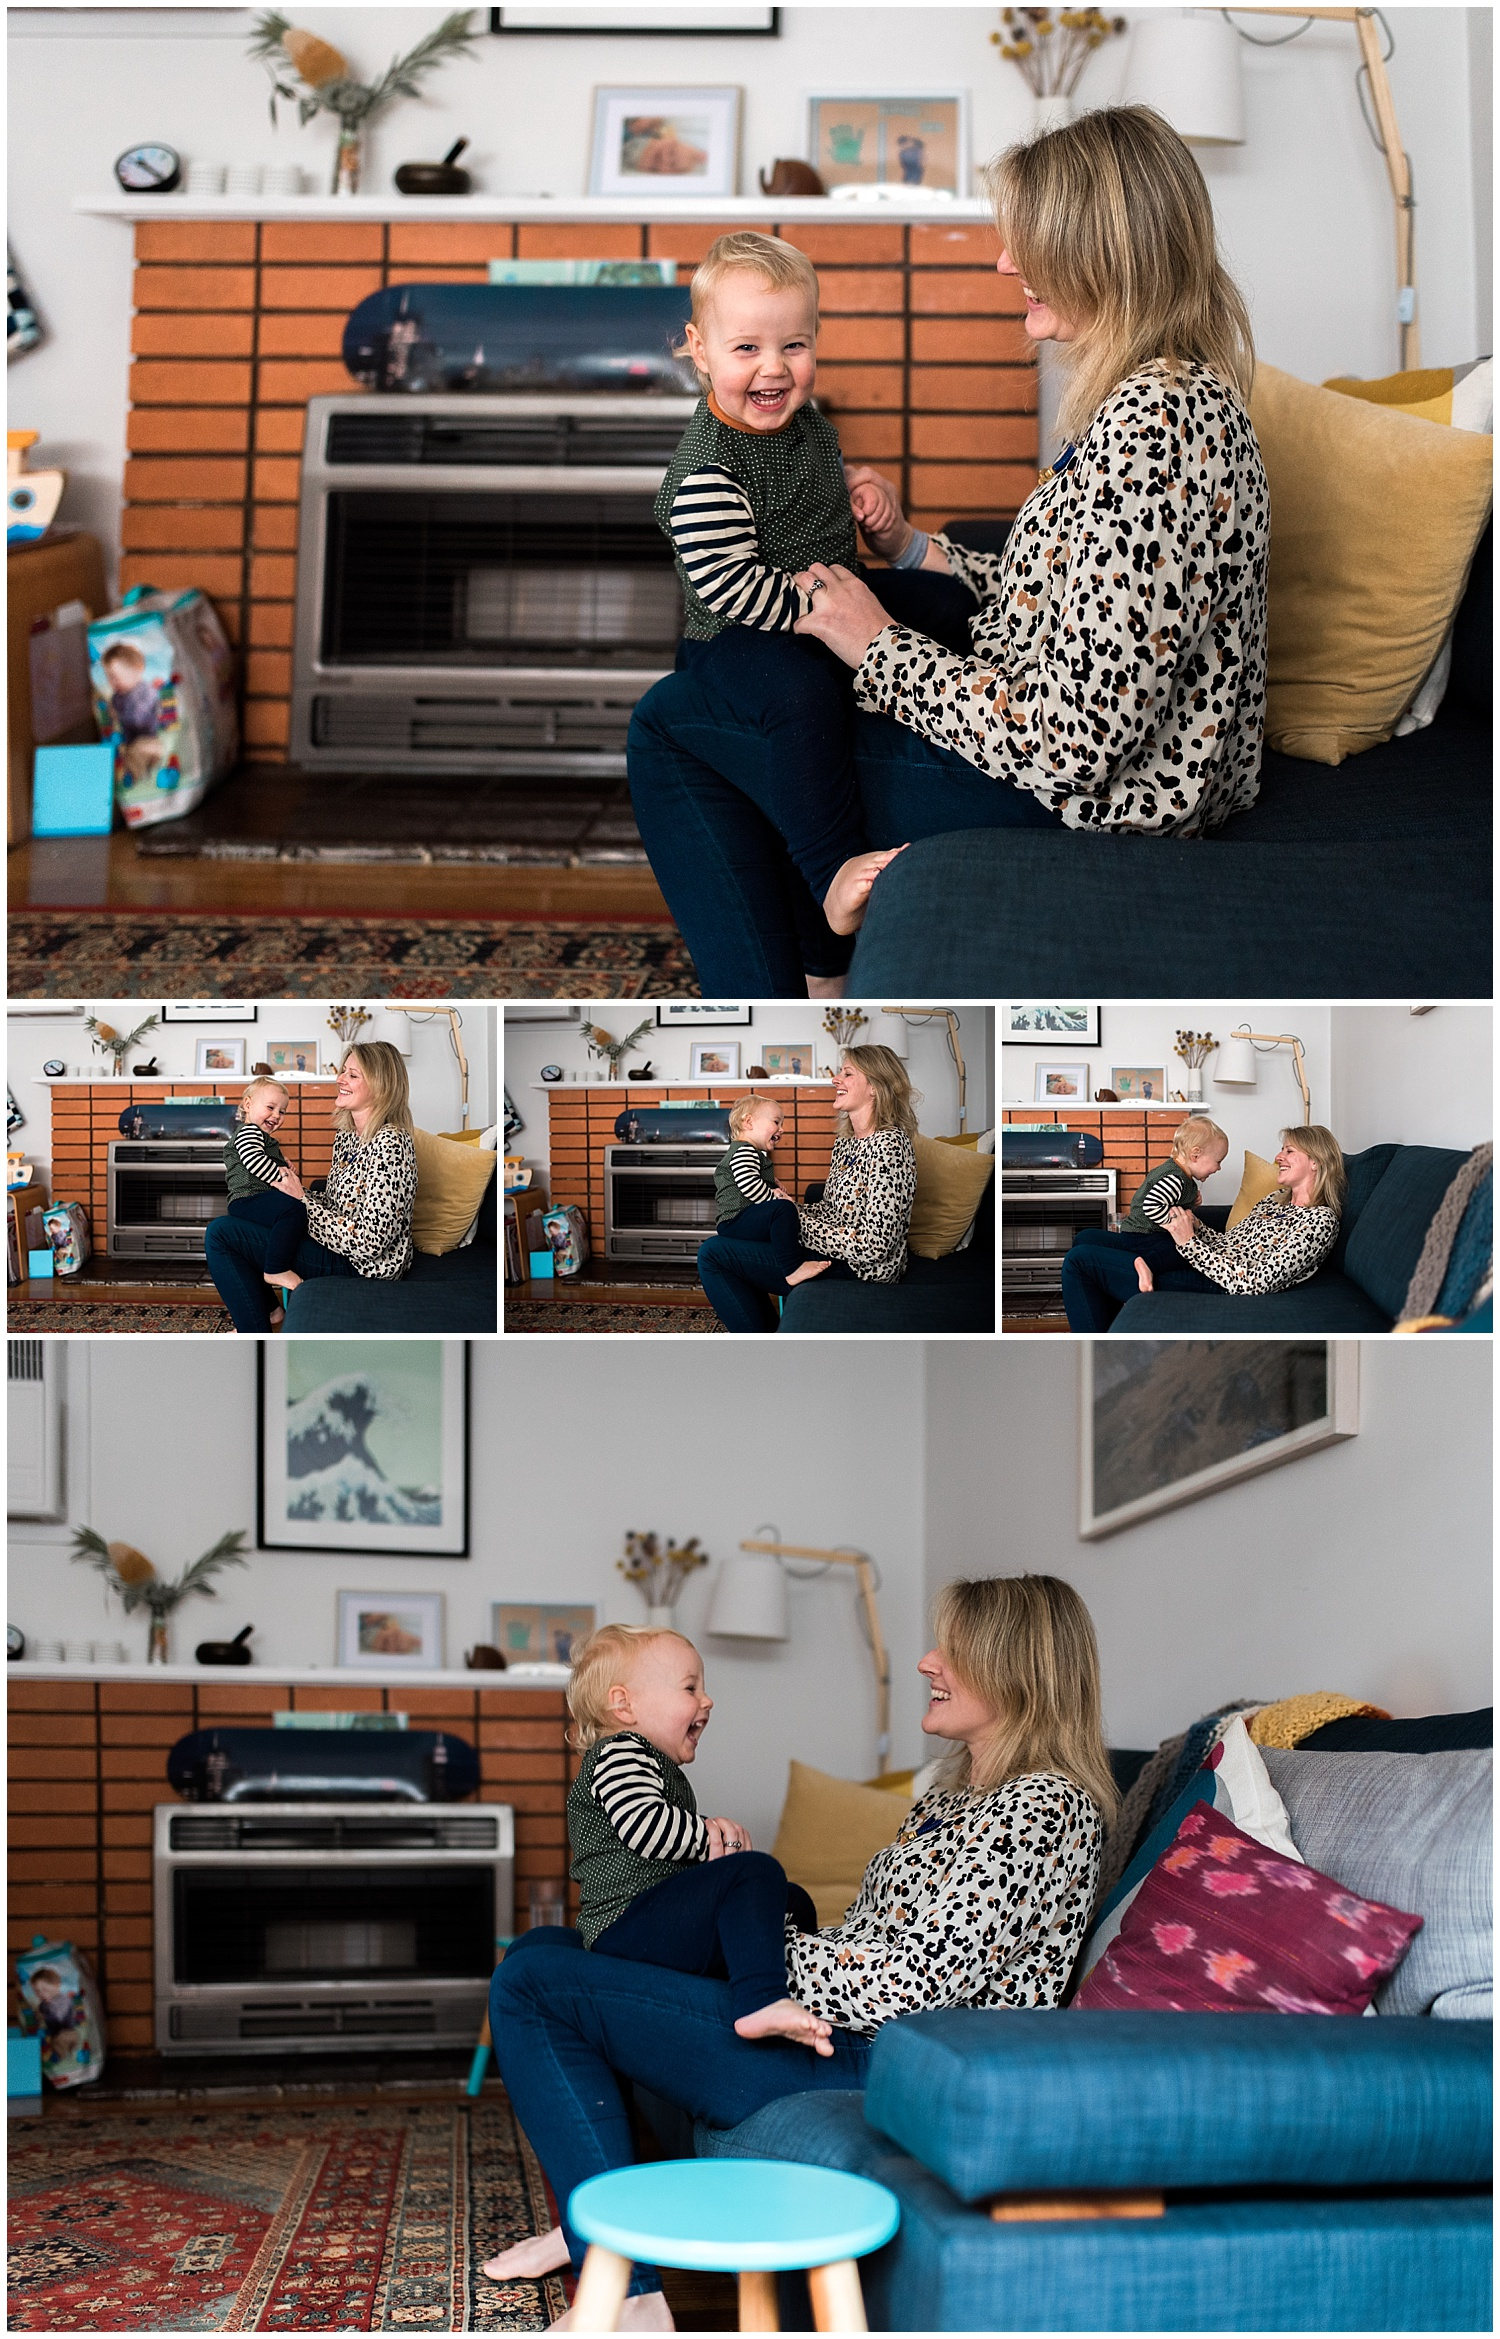 jess worrall family lifestyle photographer